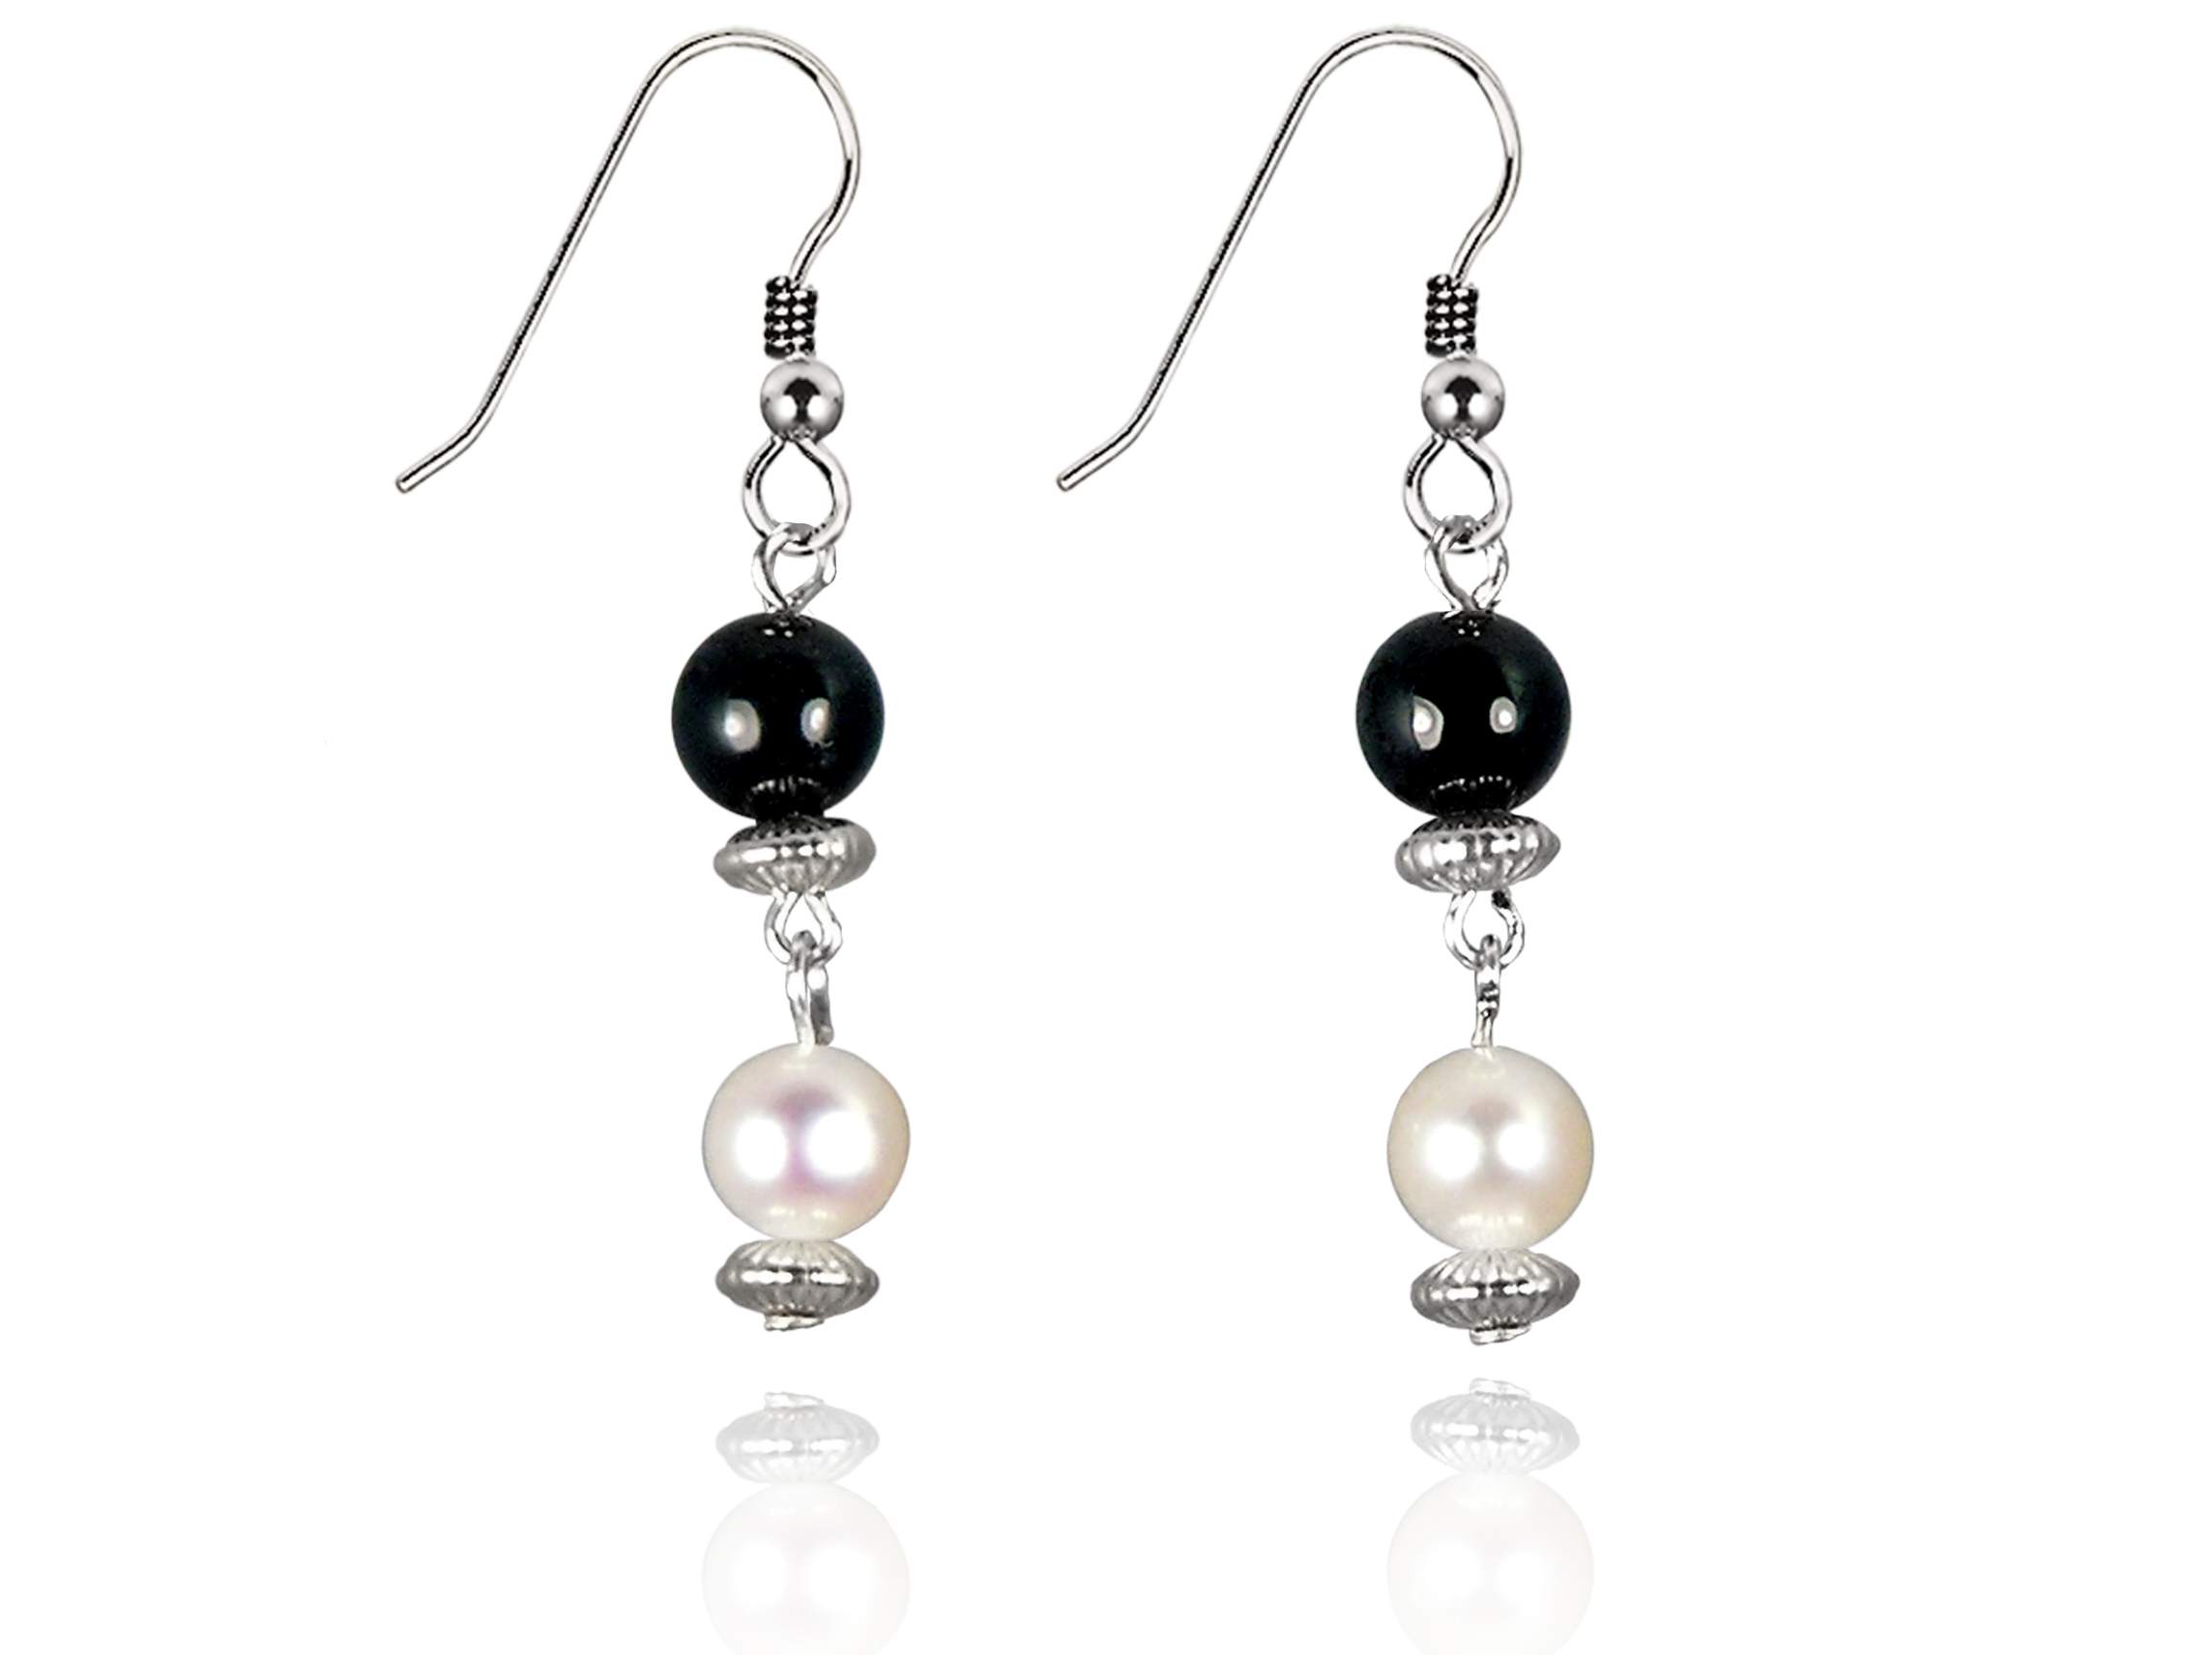 Freshwater Pearl Earrings with Black Onyx in Sterling Silver